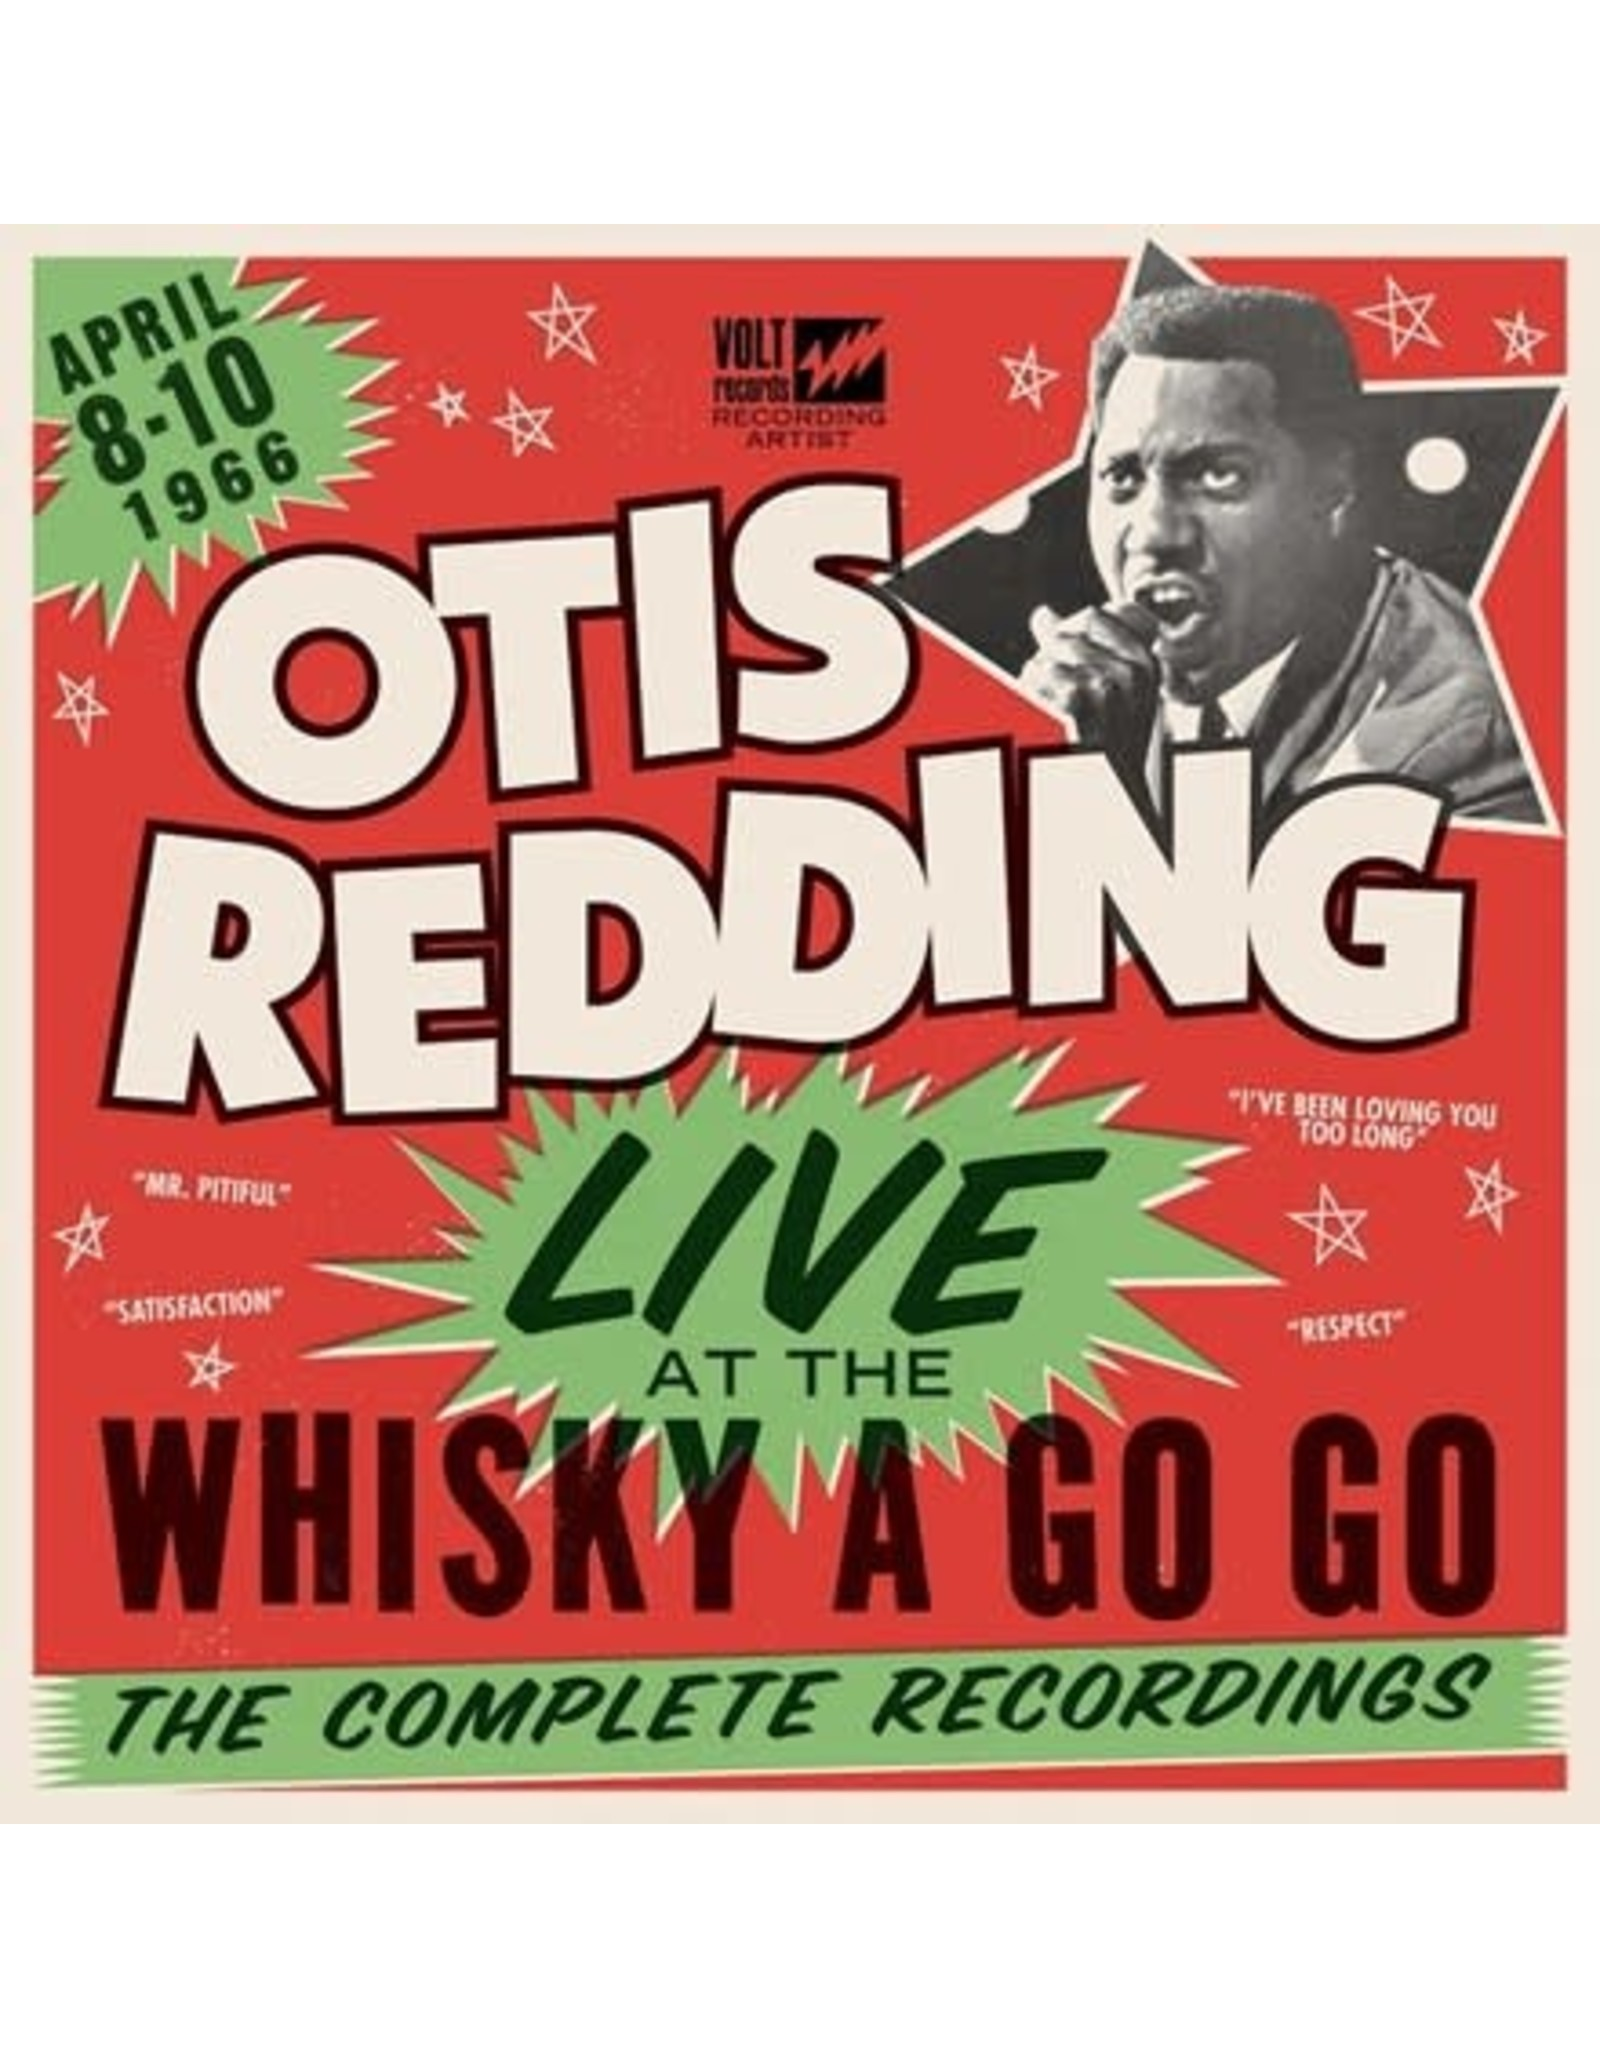 Fantasy Redding, Otis: Live At the Whiskey a Go Go LP